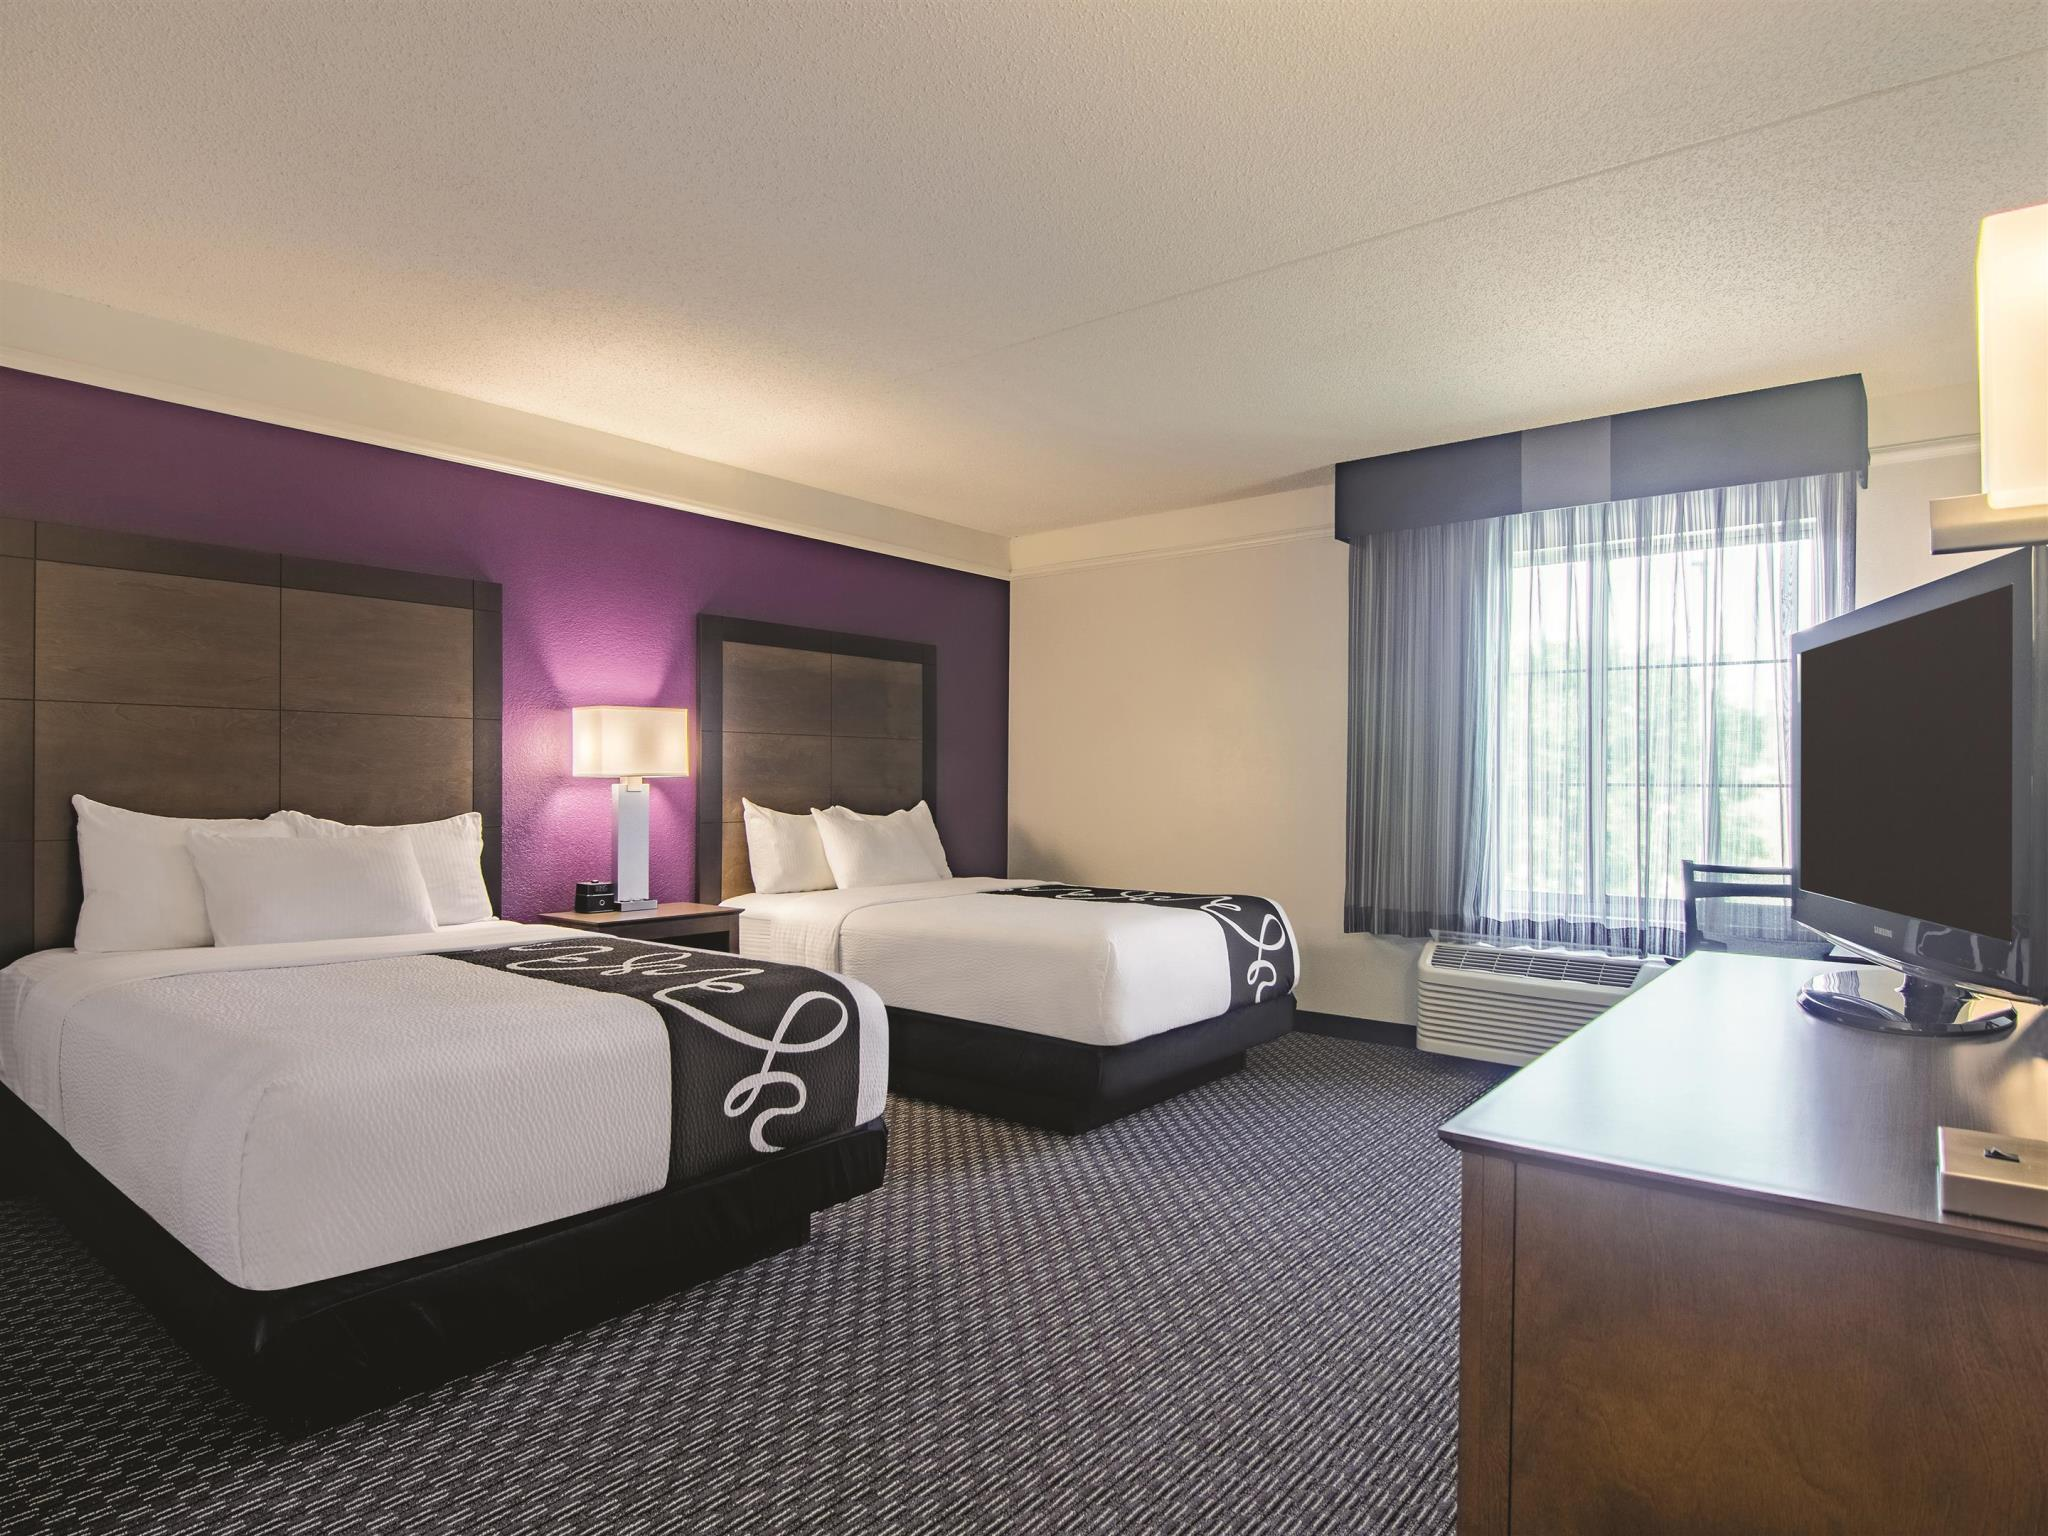 La Quinta Inn And Suites By Wyndham Oklahoma City Norman